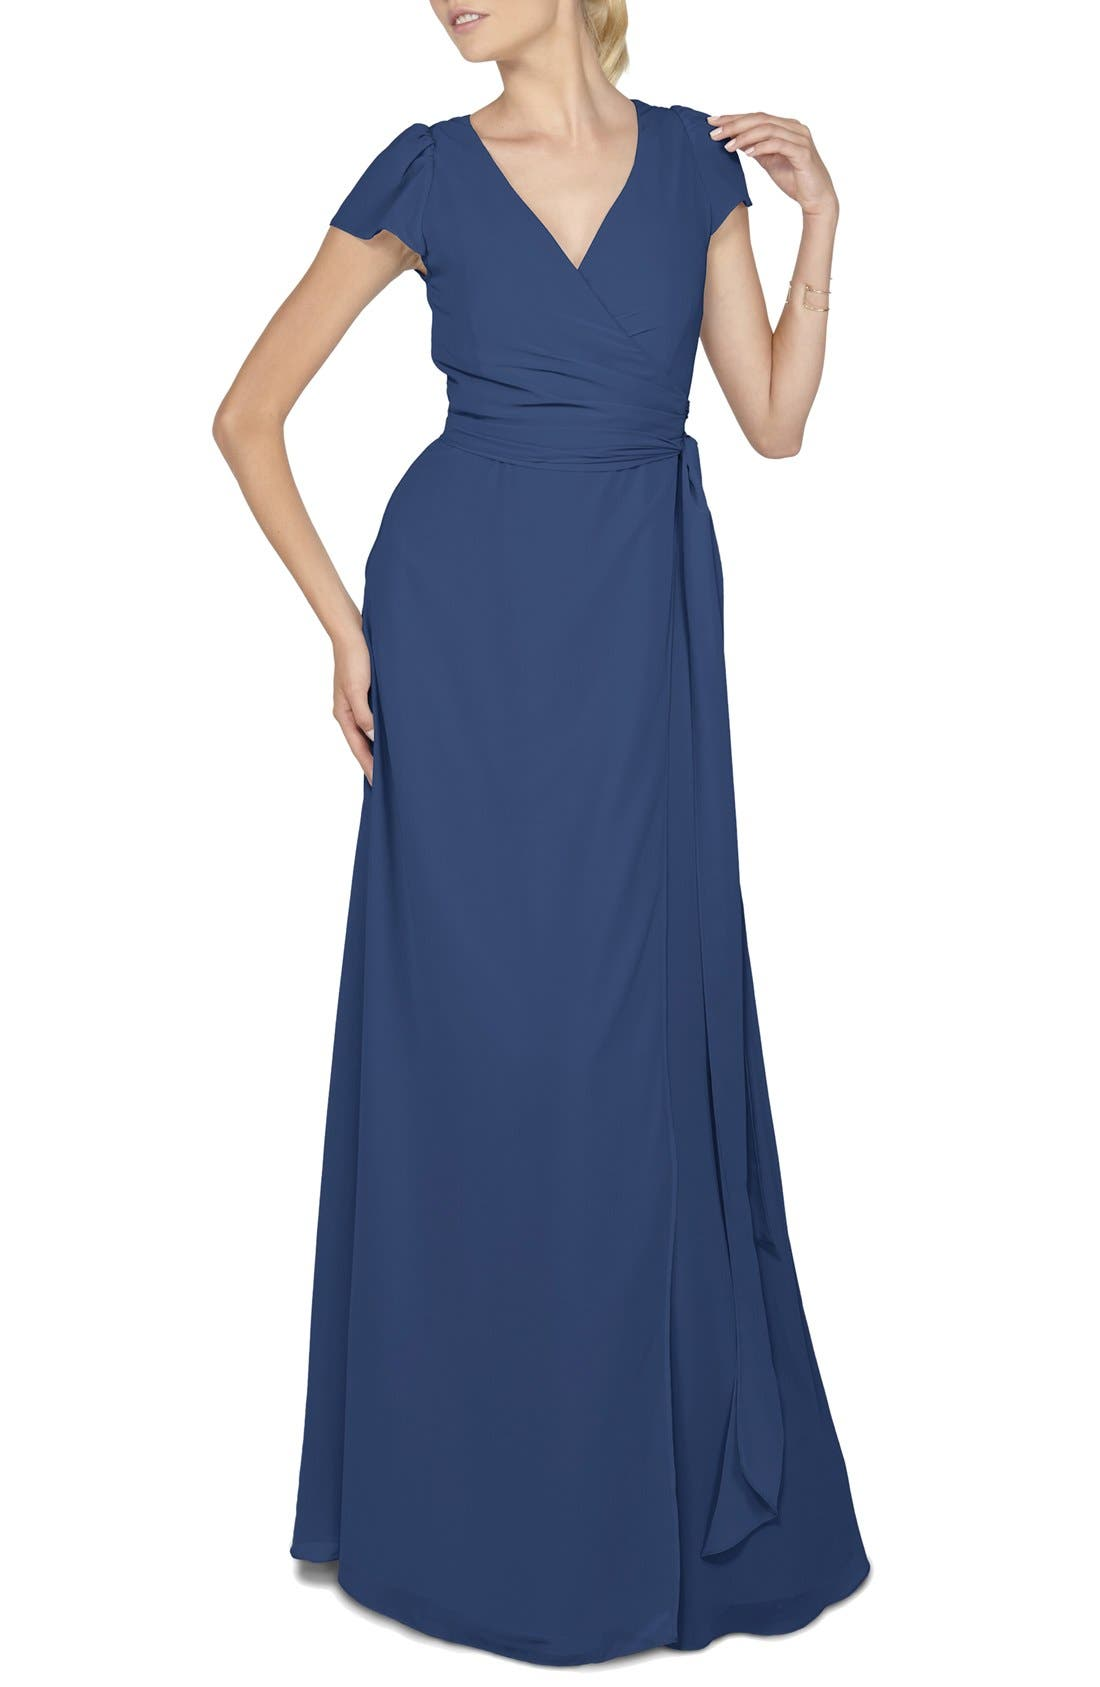 Ceremony by Joanna August 'Aurele' Cap Sleeve Chiffon Wrap Gown